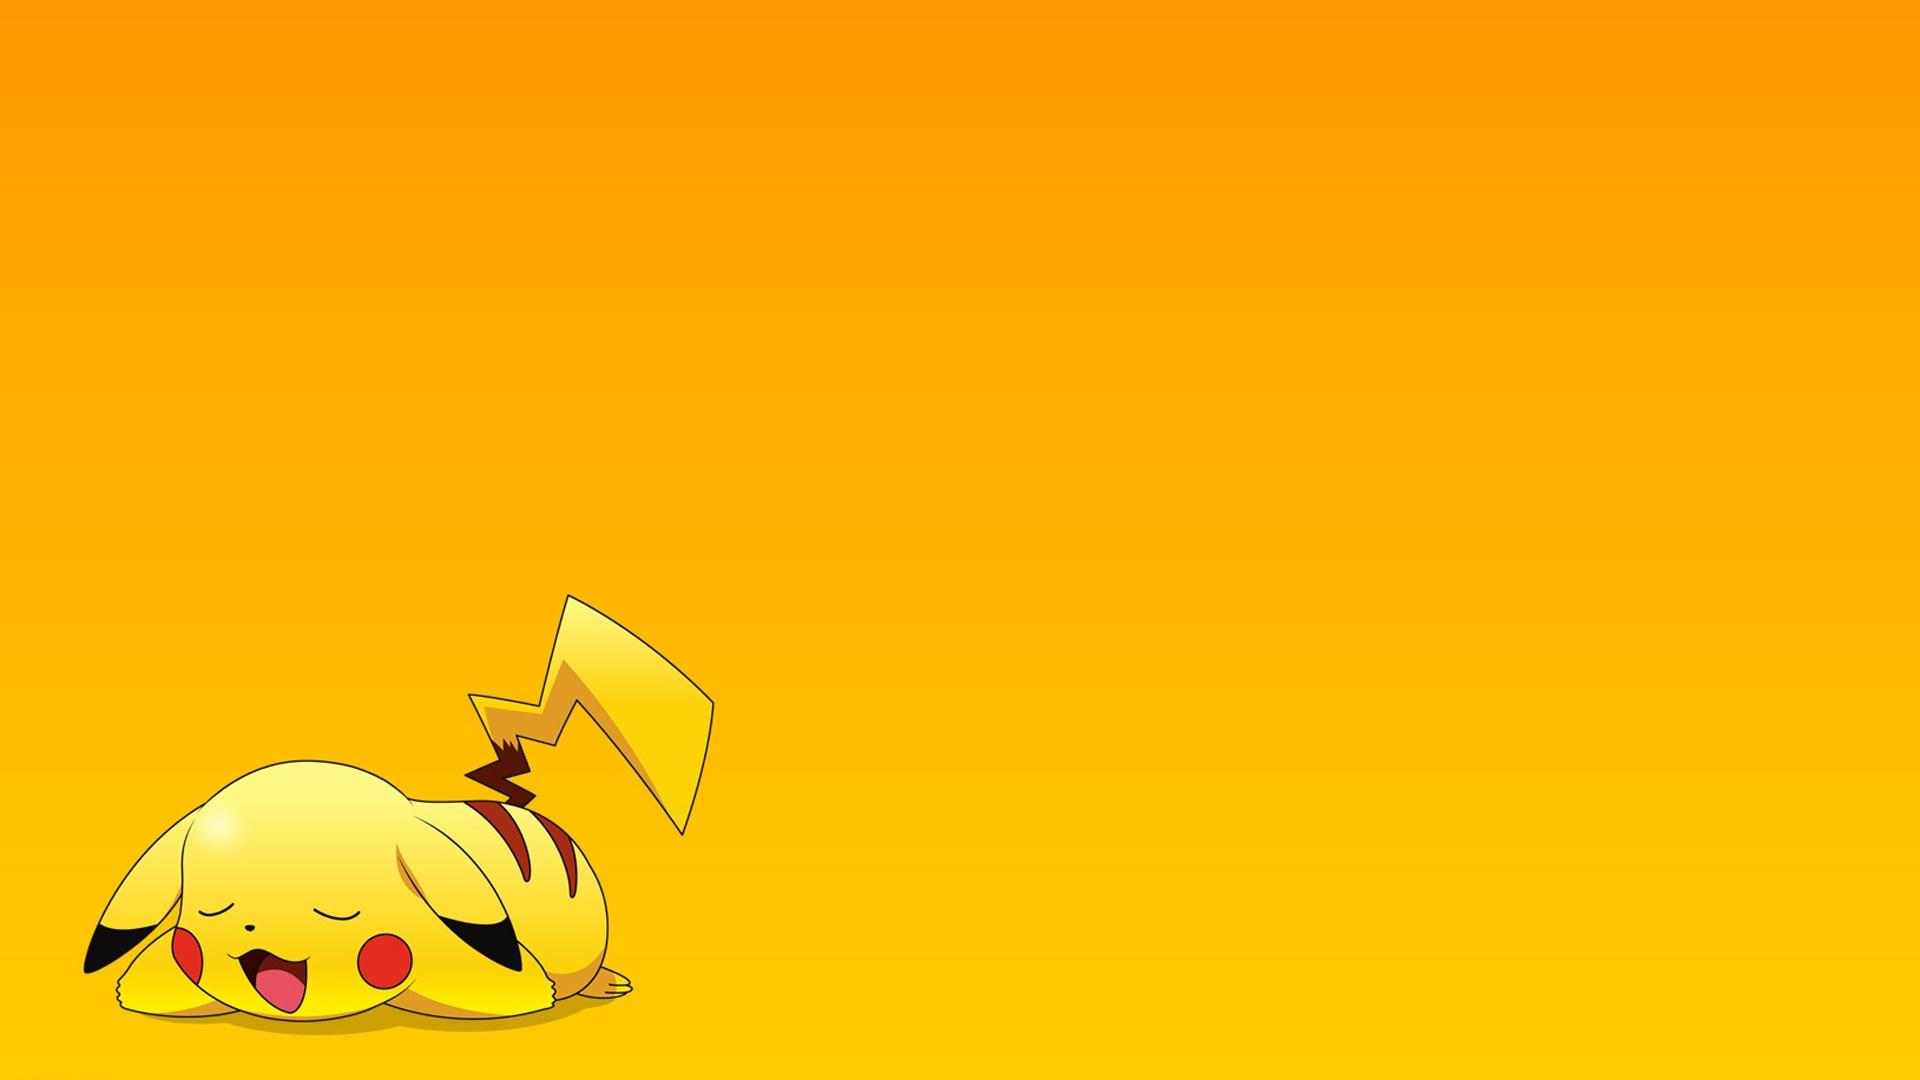 Download Pikachu Wallpaper Hd 1920x1080 124062 Full Size DesktopAS 1920x1080